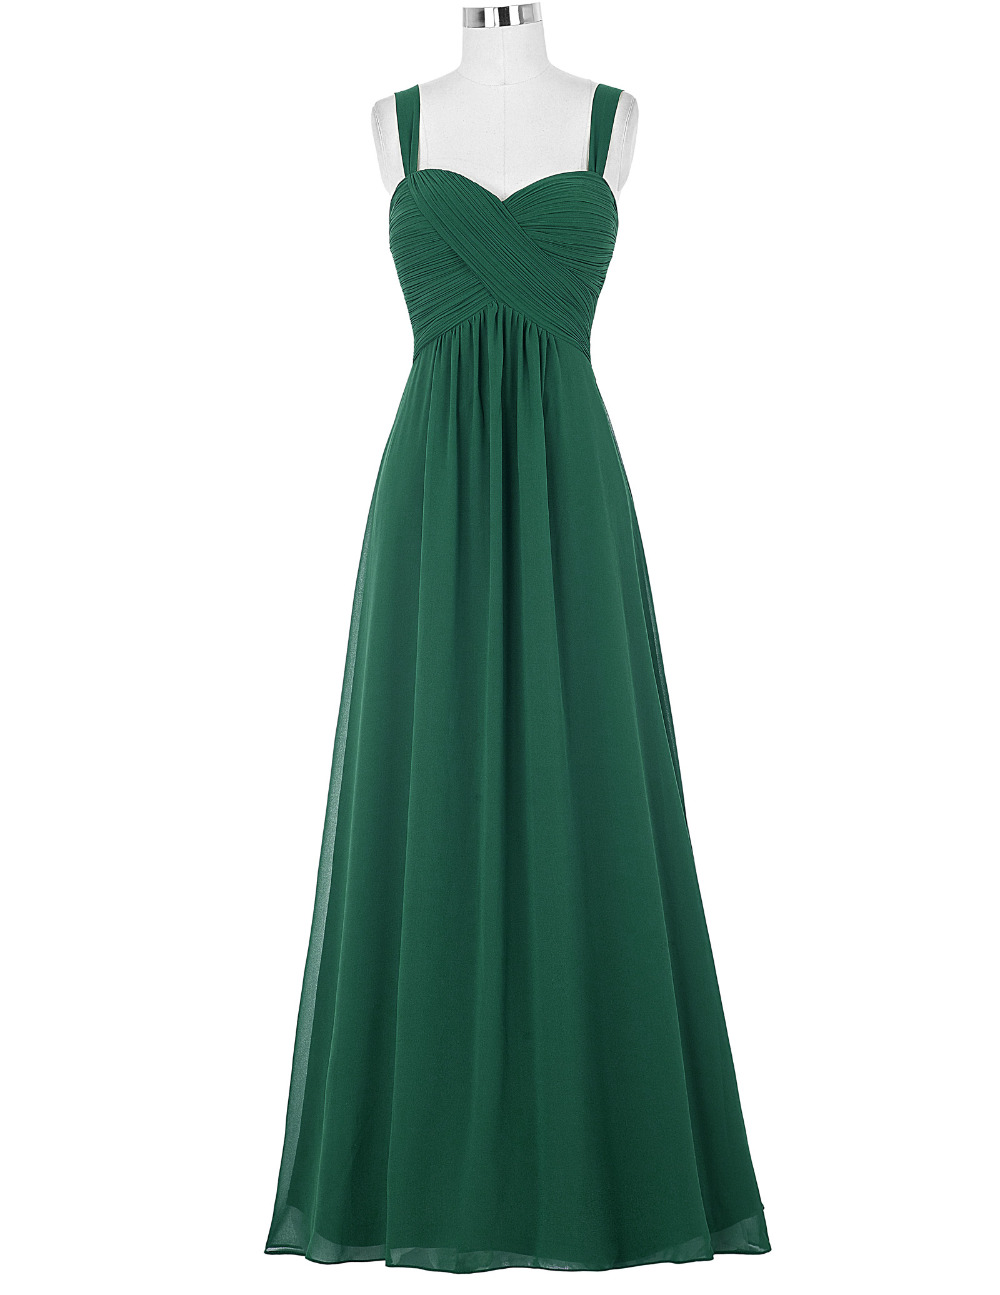 Popular Emerald Green Wedding Dress Buy Cheap Emerald